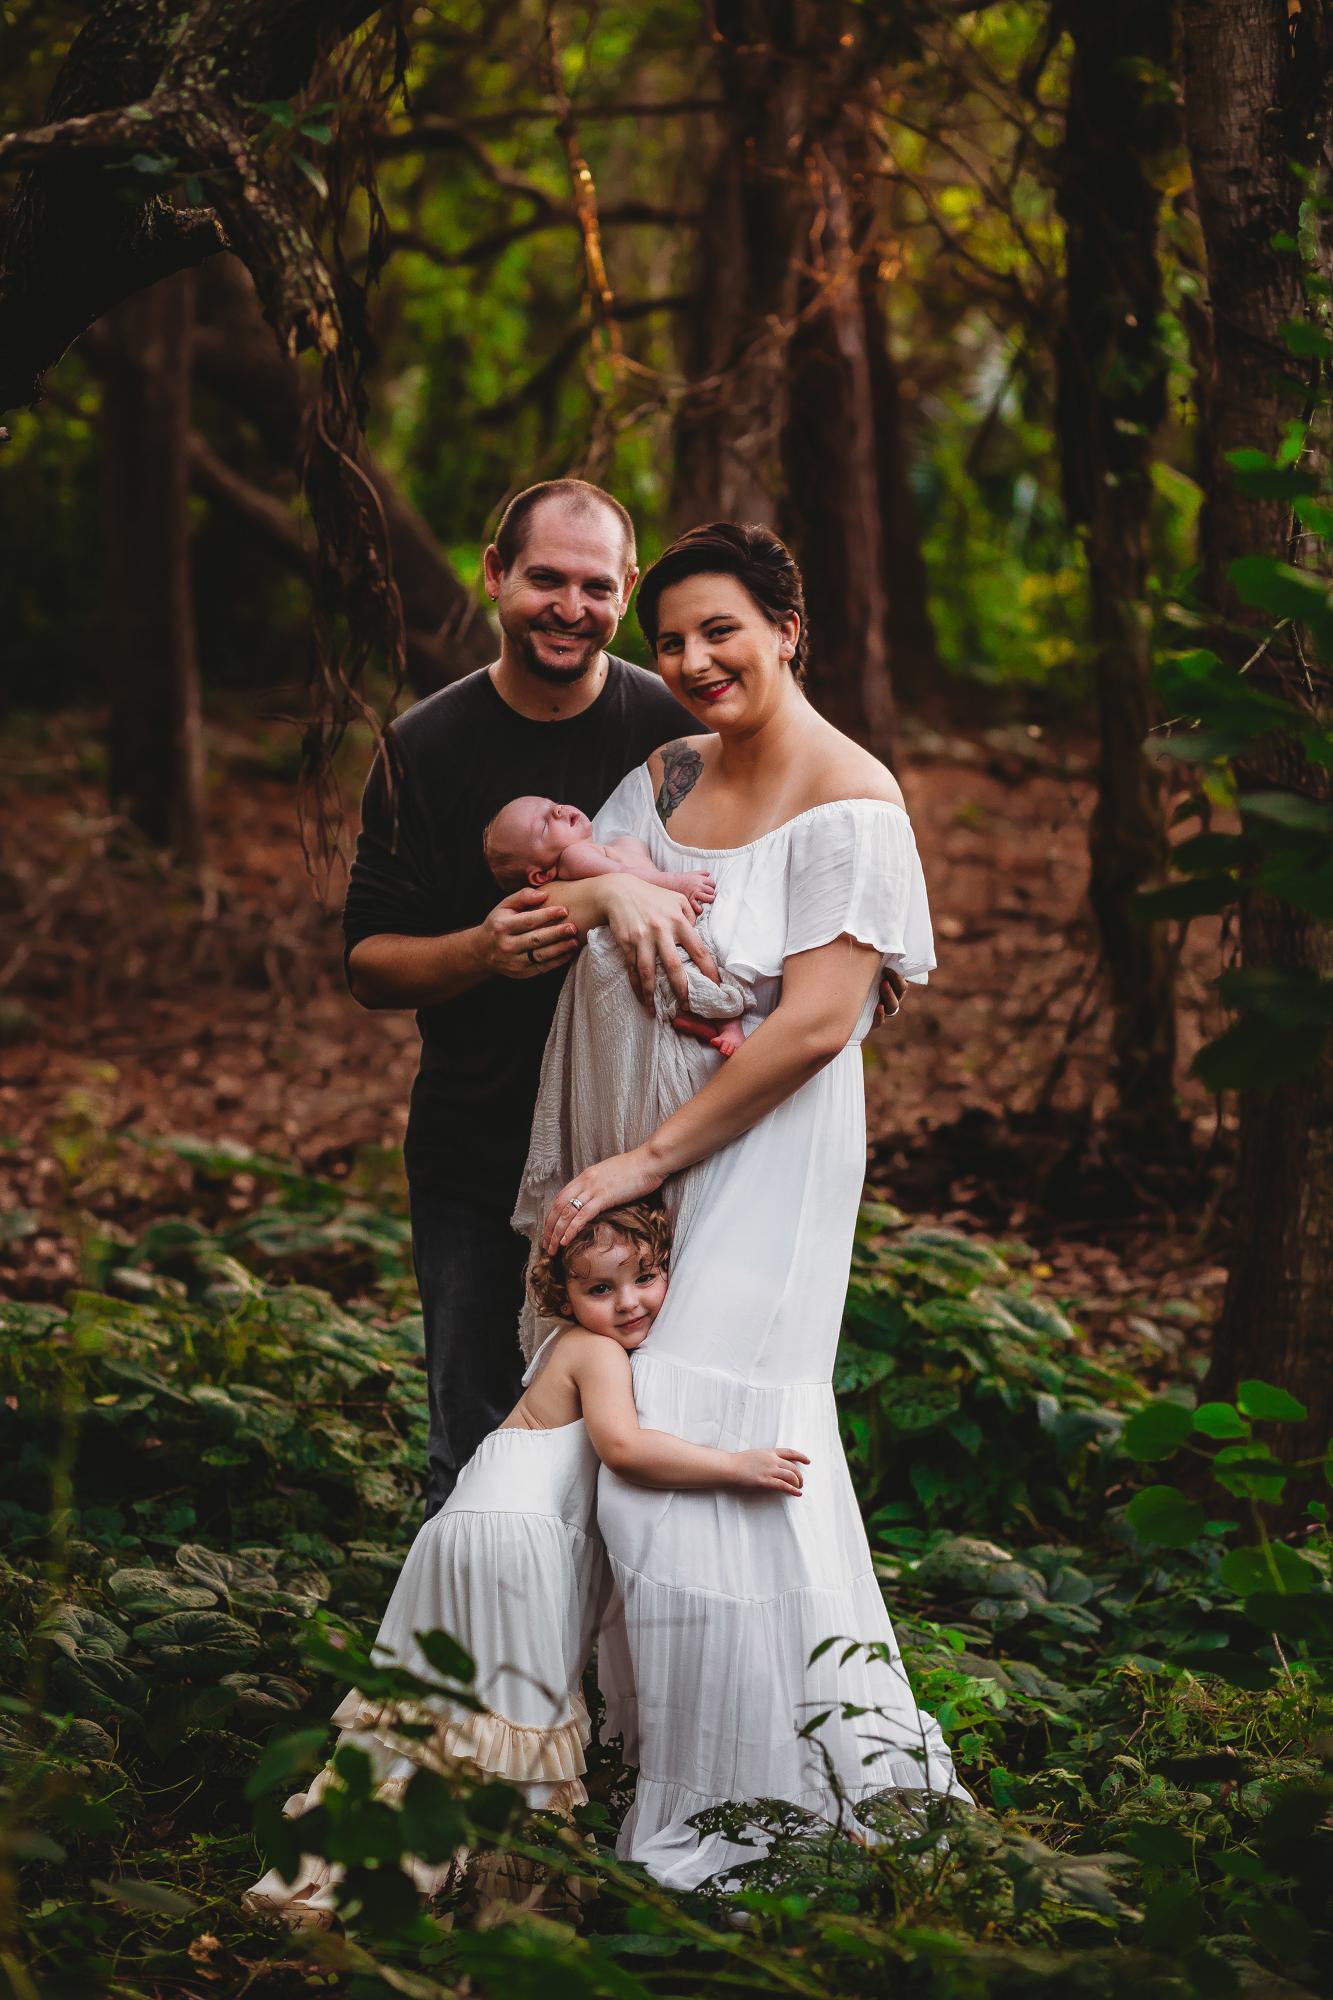 lifestyle newborn photographer st pete fl